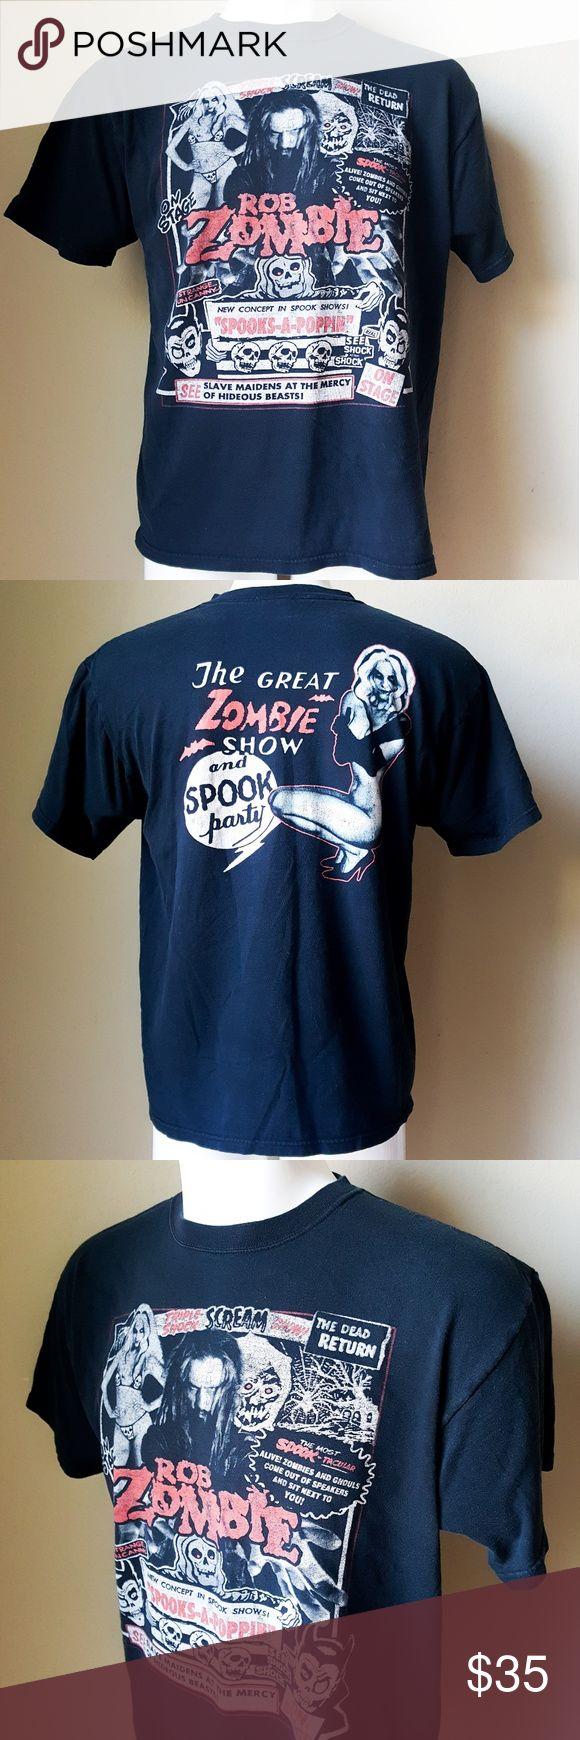 "Rob Zombie Short Sleeve Men's Shirt Anvil Rob Zombie Men's Shirt  Short Sleeve  Preowned Washed  •armpits 22"" •length 26"" -A8- Anvil Shirts Tees - Short Sleeve"